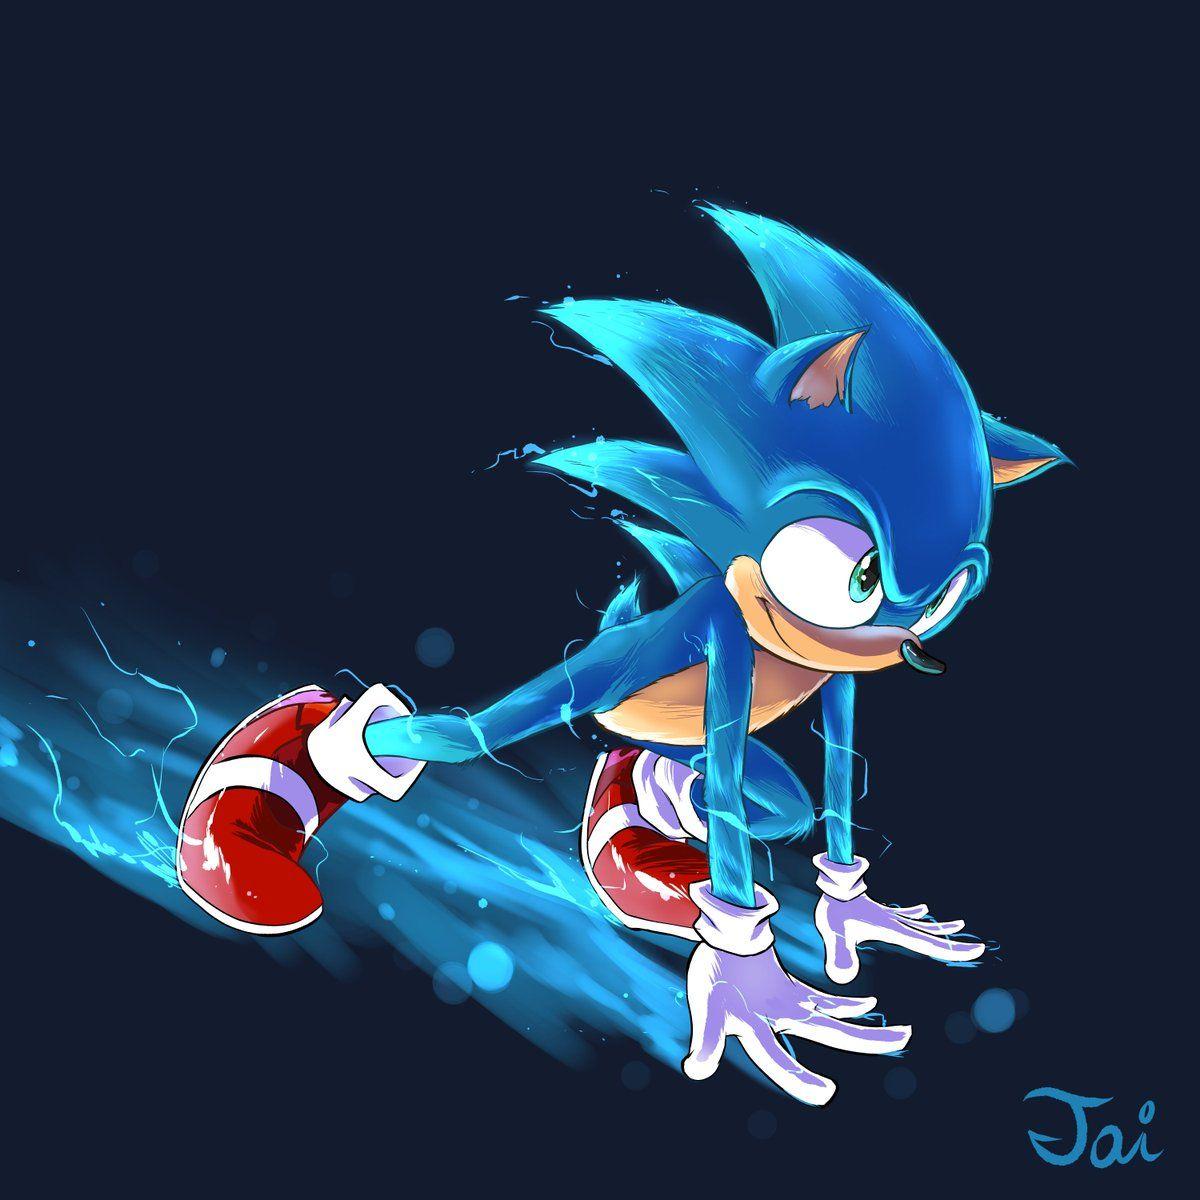 Levon Bellamy Comms Open Blm Slots 3 On Twitter Hedgehog Art Sonic The Hedgehog Sonic Art